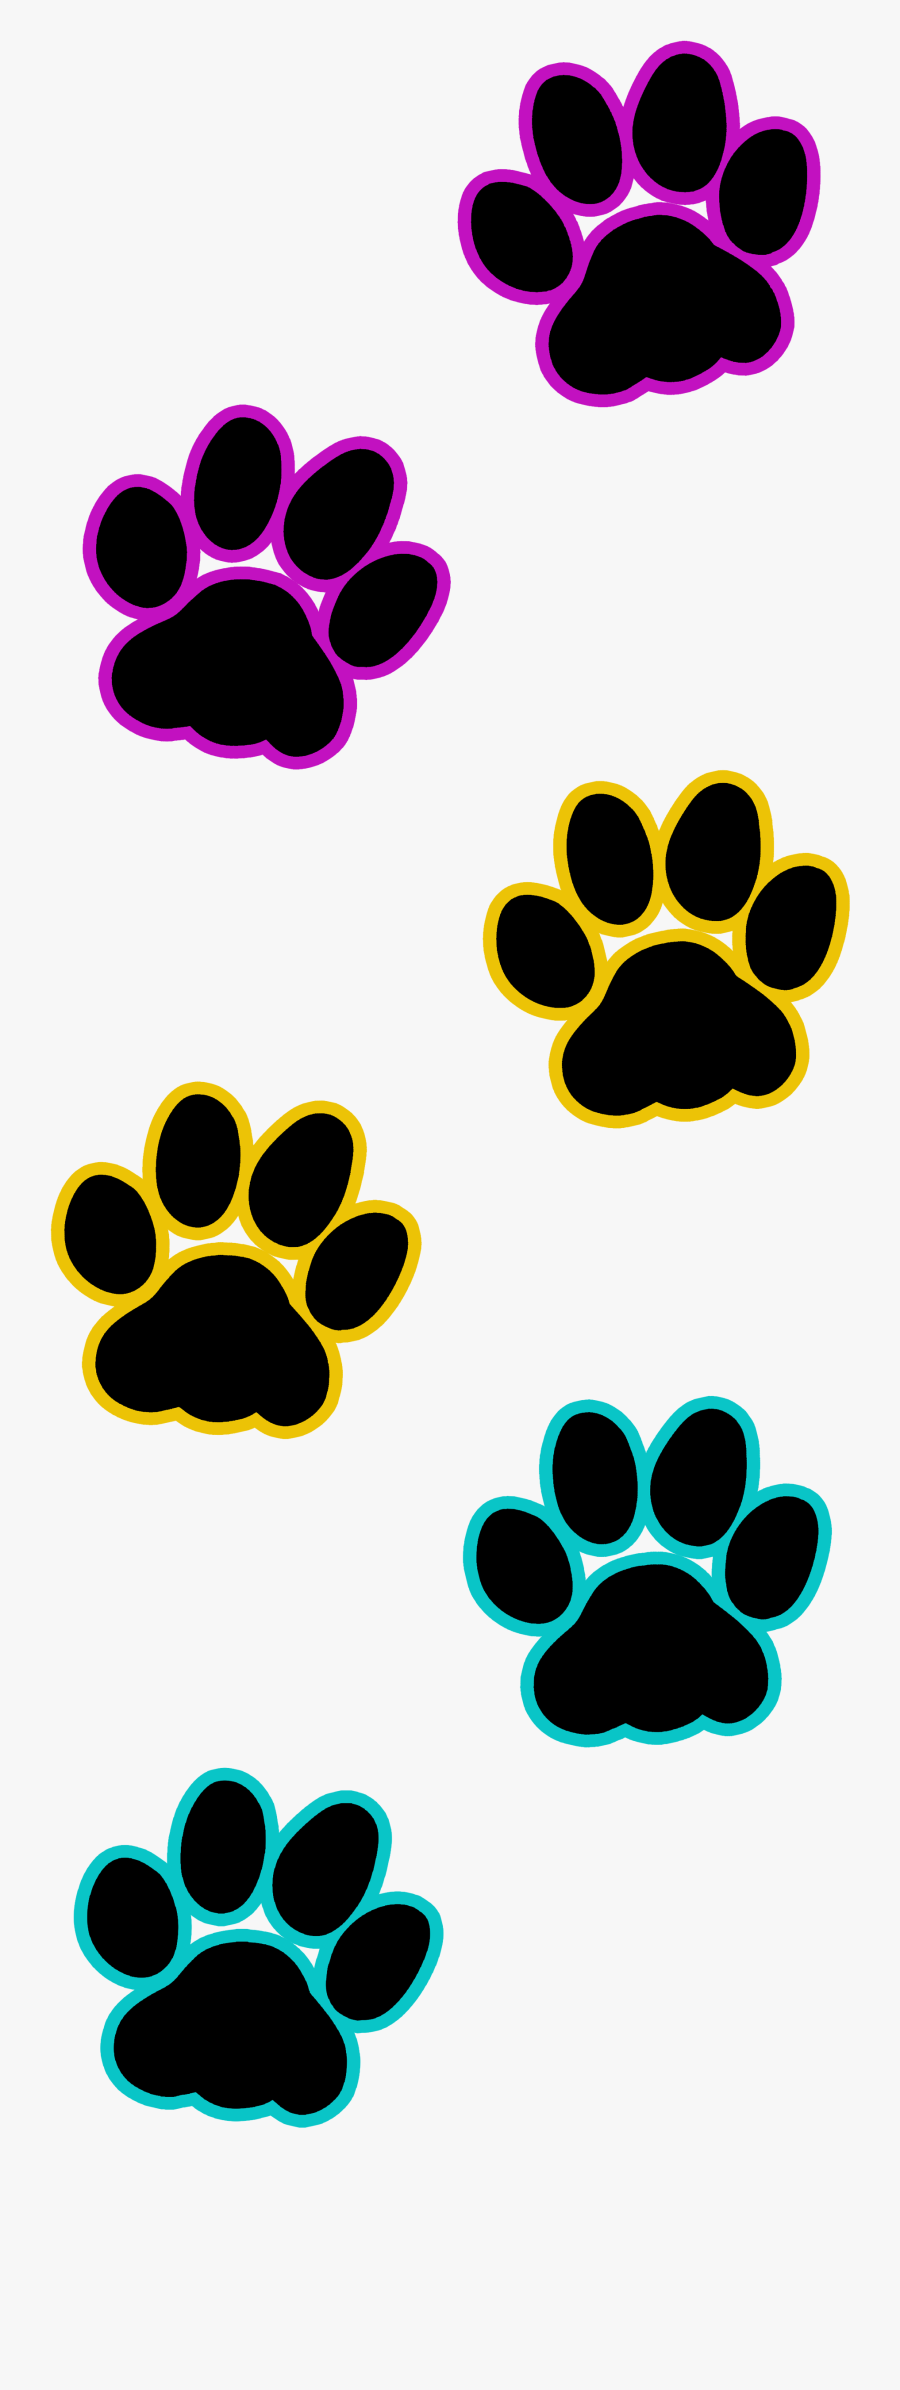 Ideas Cat Paw Print Transparent Kitty Paw Print - Transparent Cat Paw Print Clip Art, Transparent Clipart